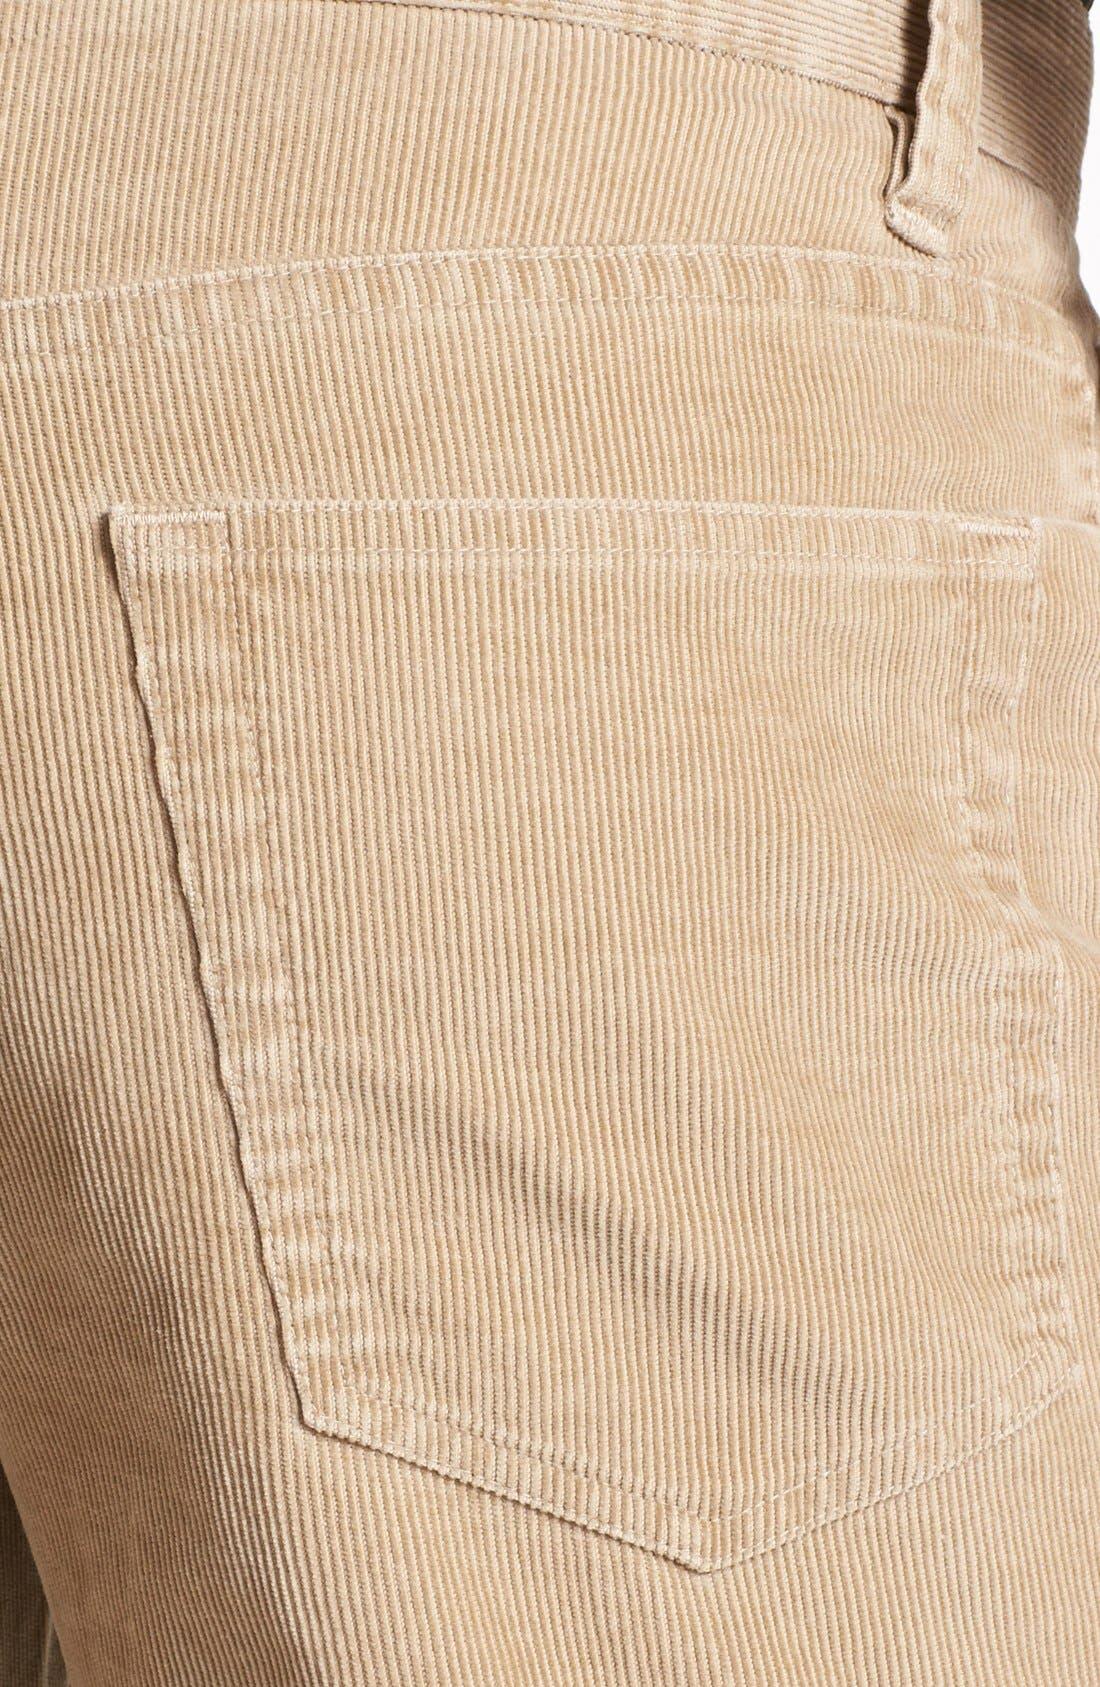 Alternate Image 3  - Wallin & Bros. Corduroy Pants